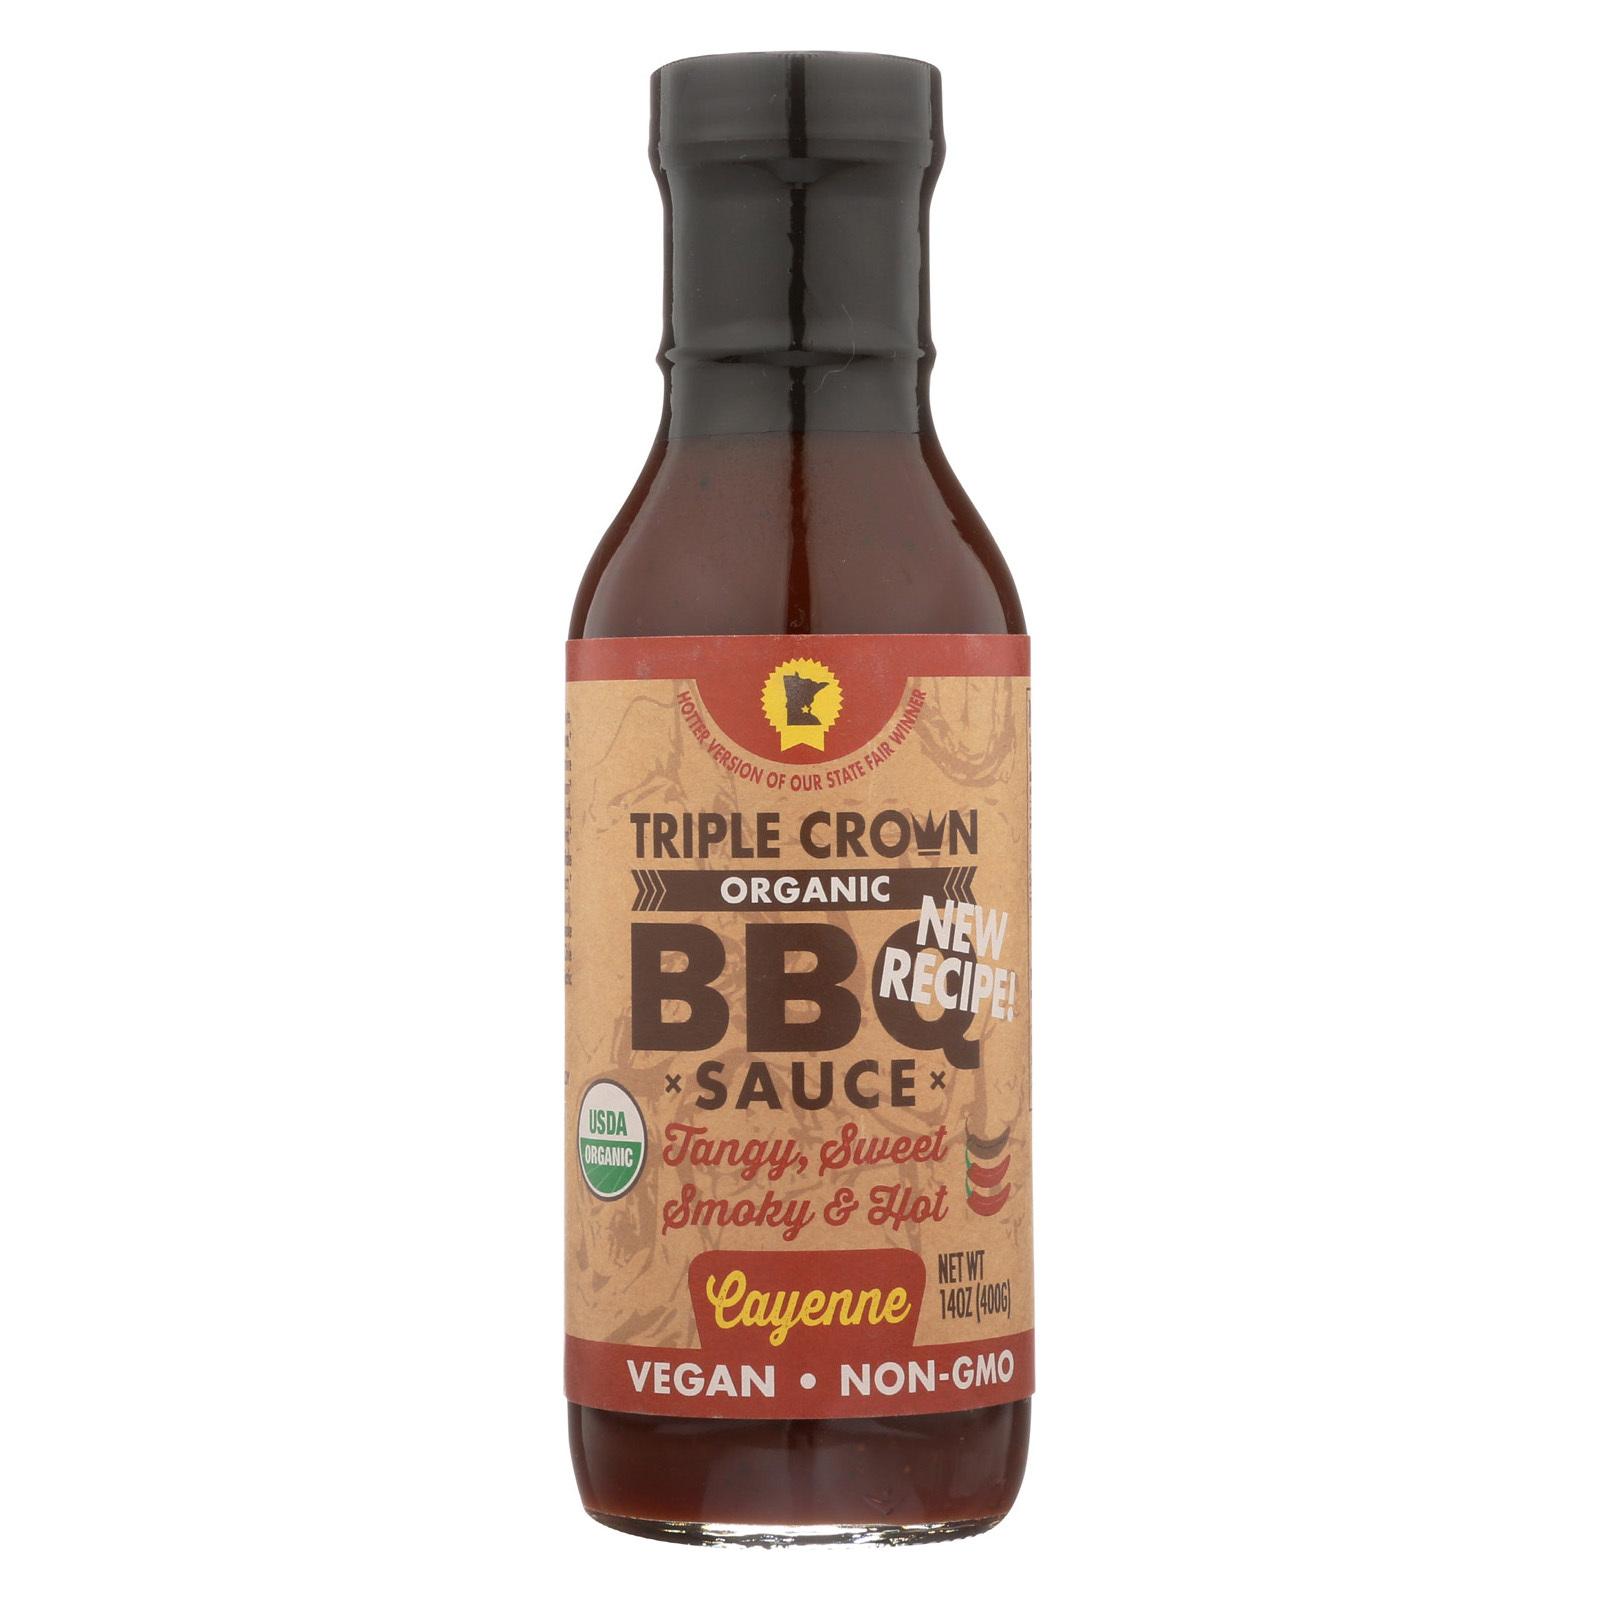 Triple Crown BBQ Sauce - Cayenne - Case of 6 - 14 fl oz